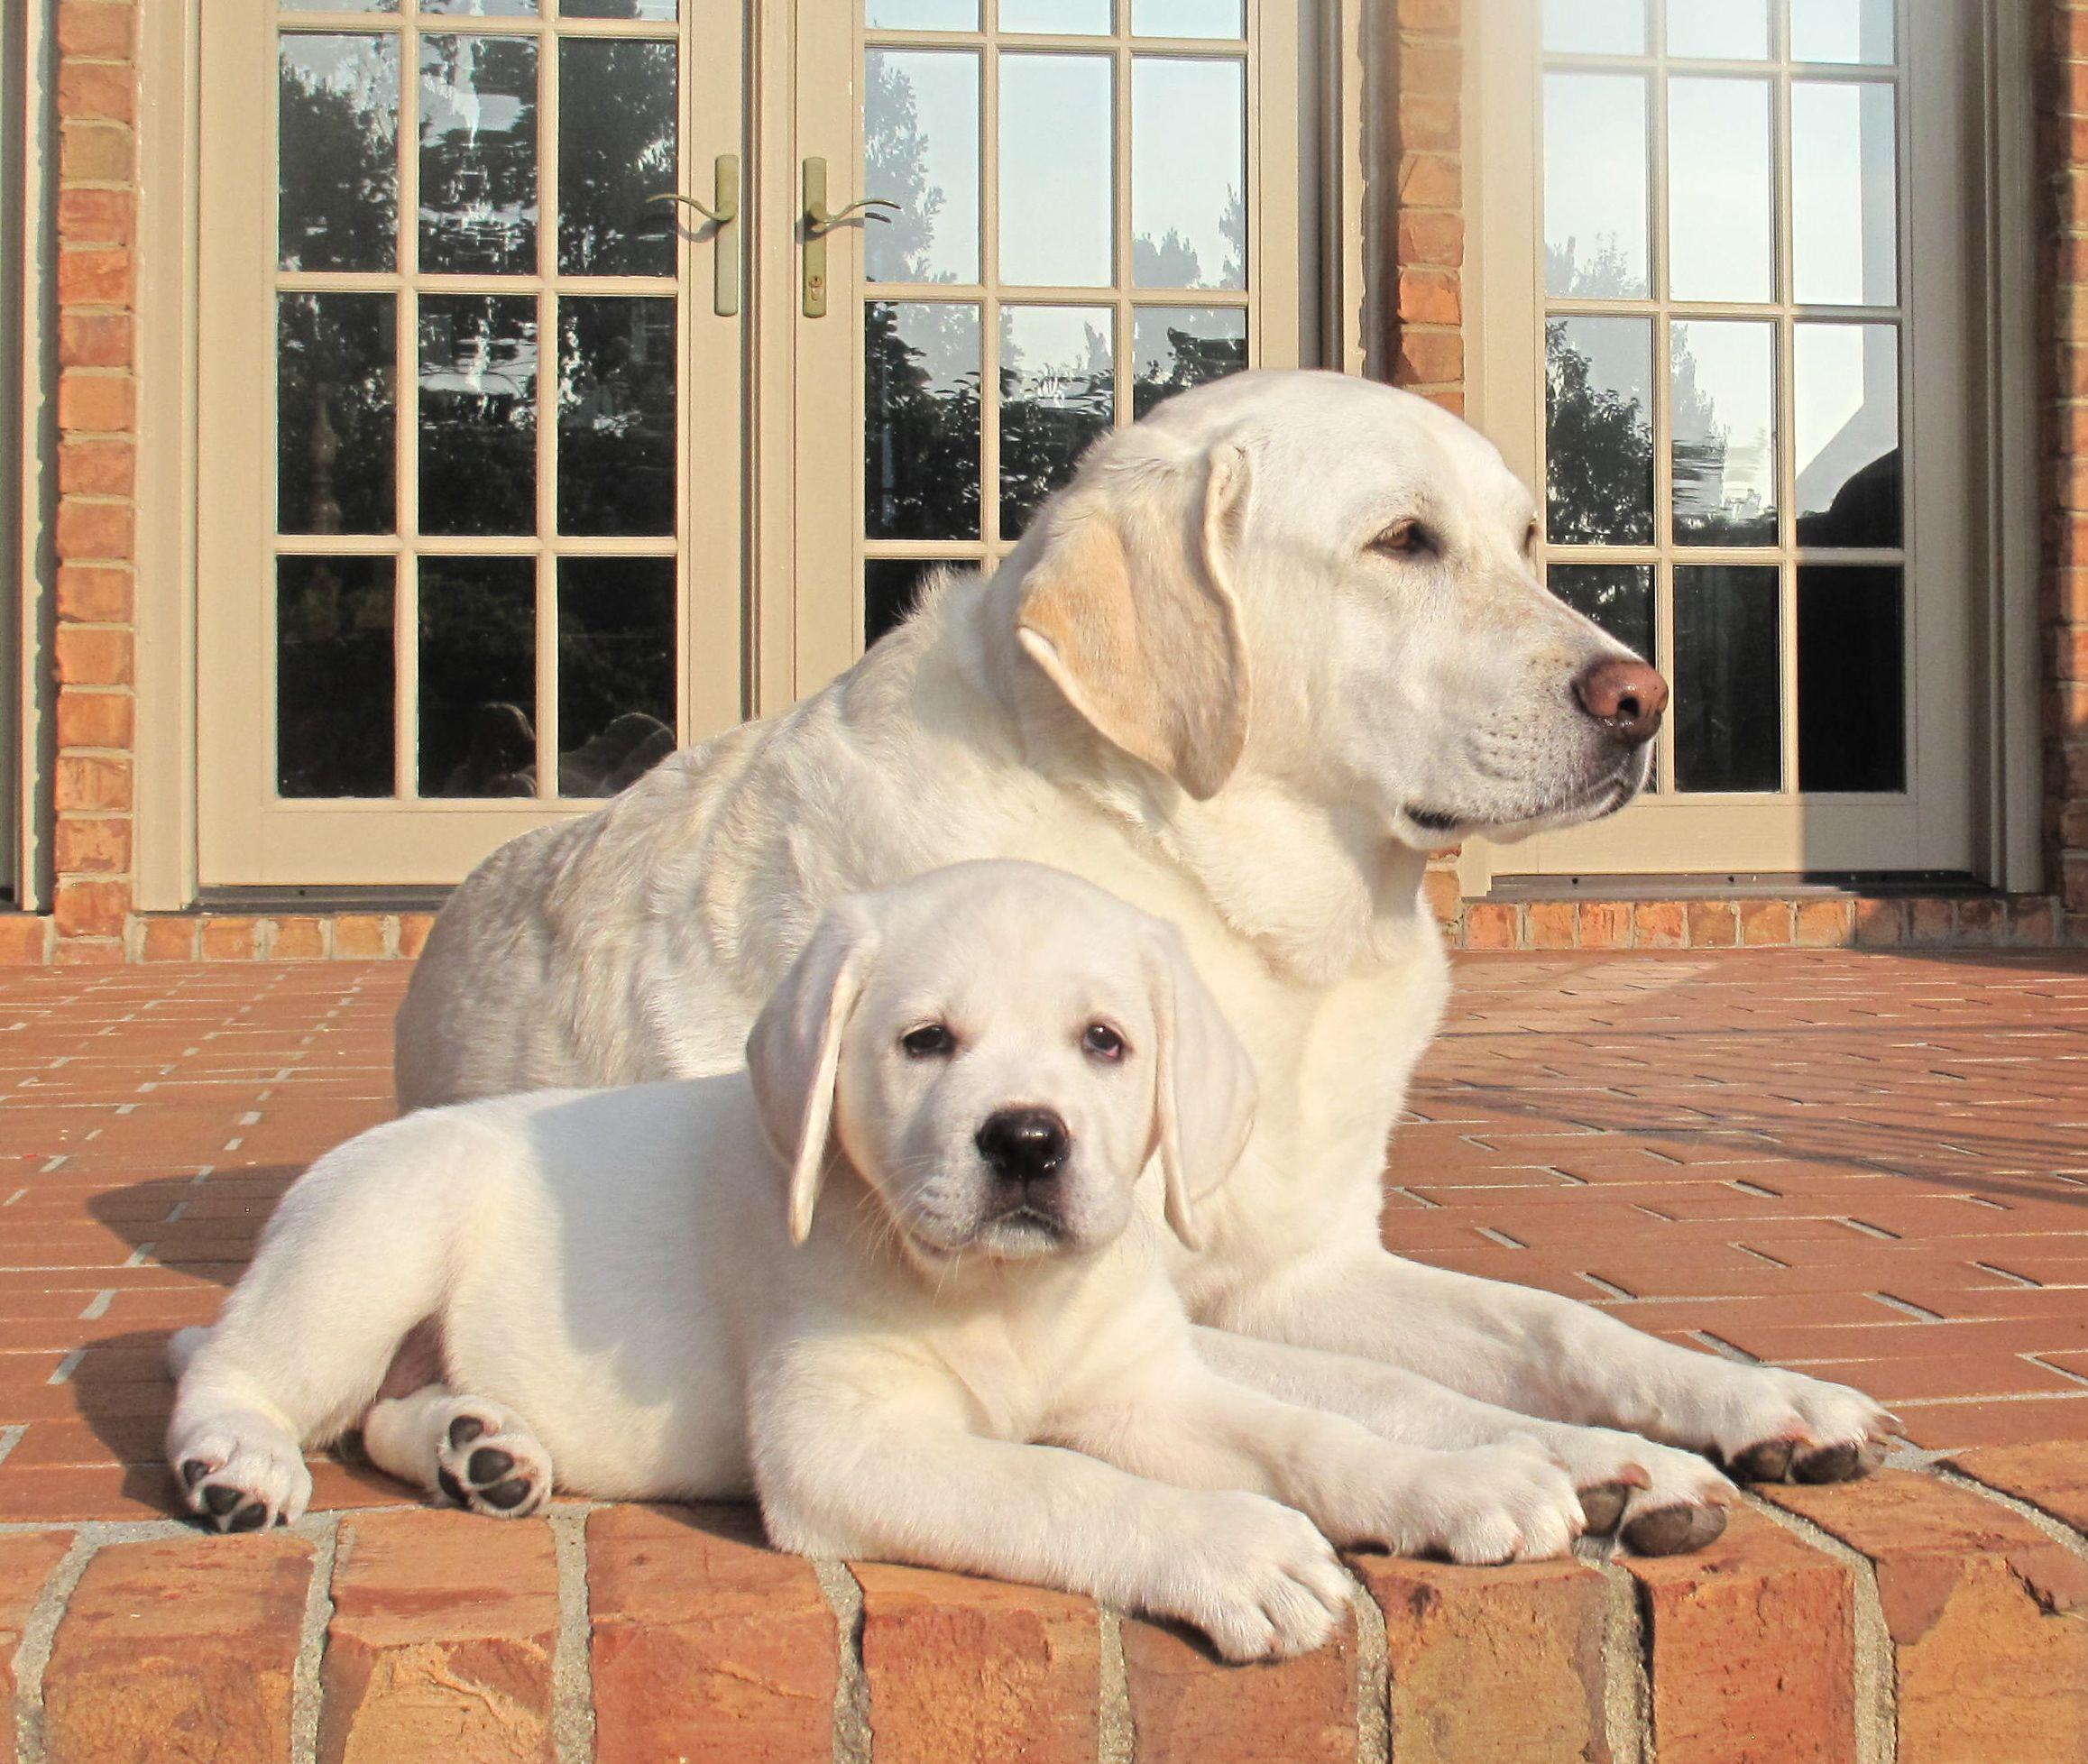 White Labradors Kuscheltier hund, Hunde, Hunderassen